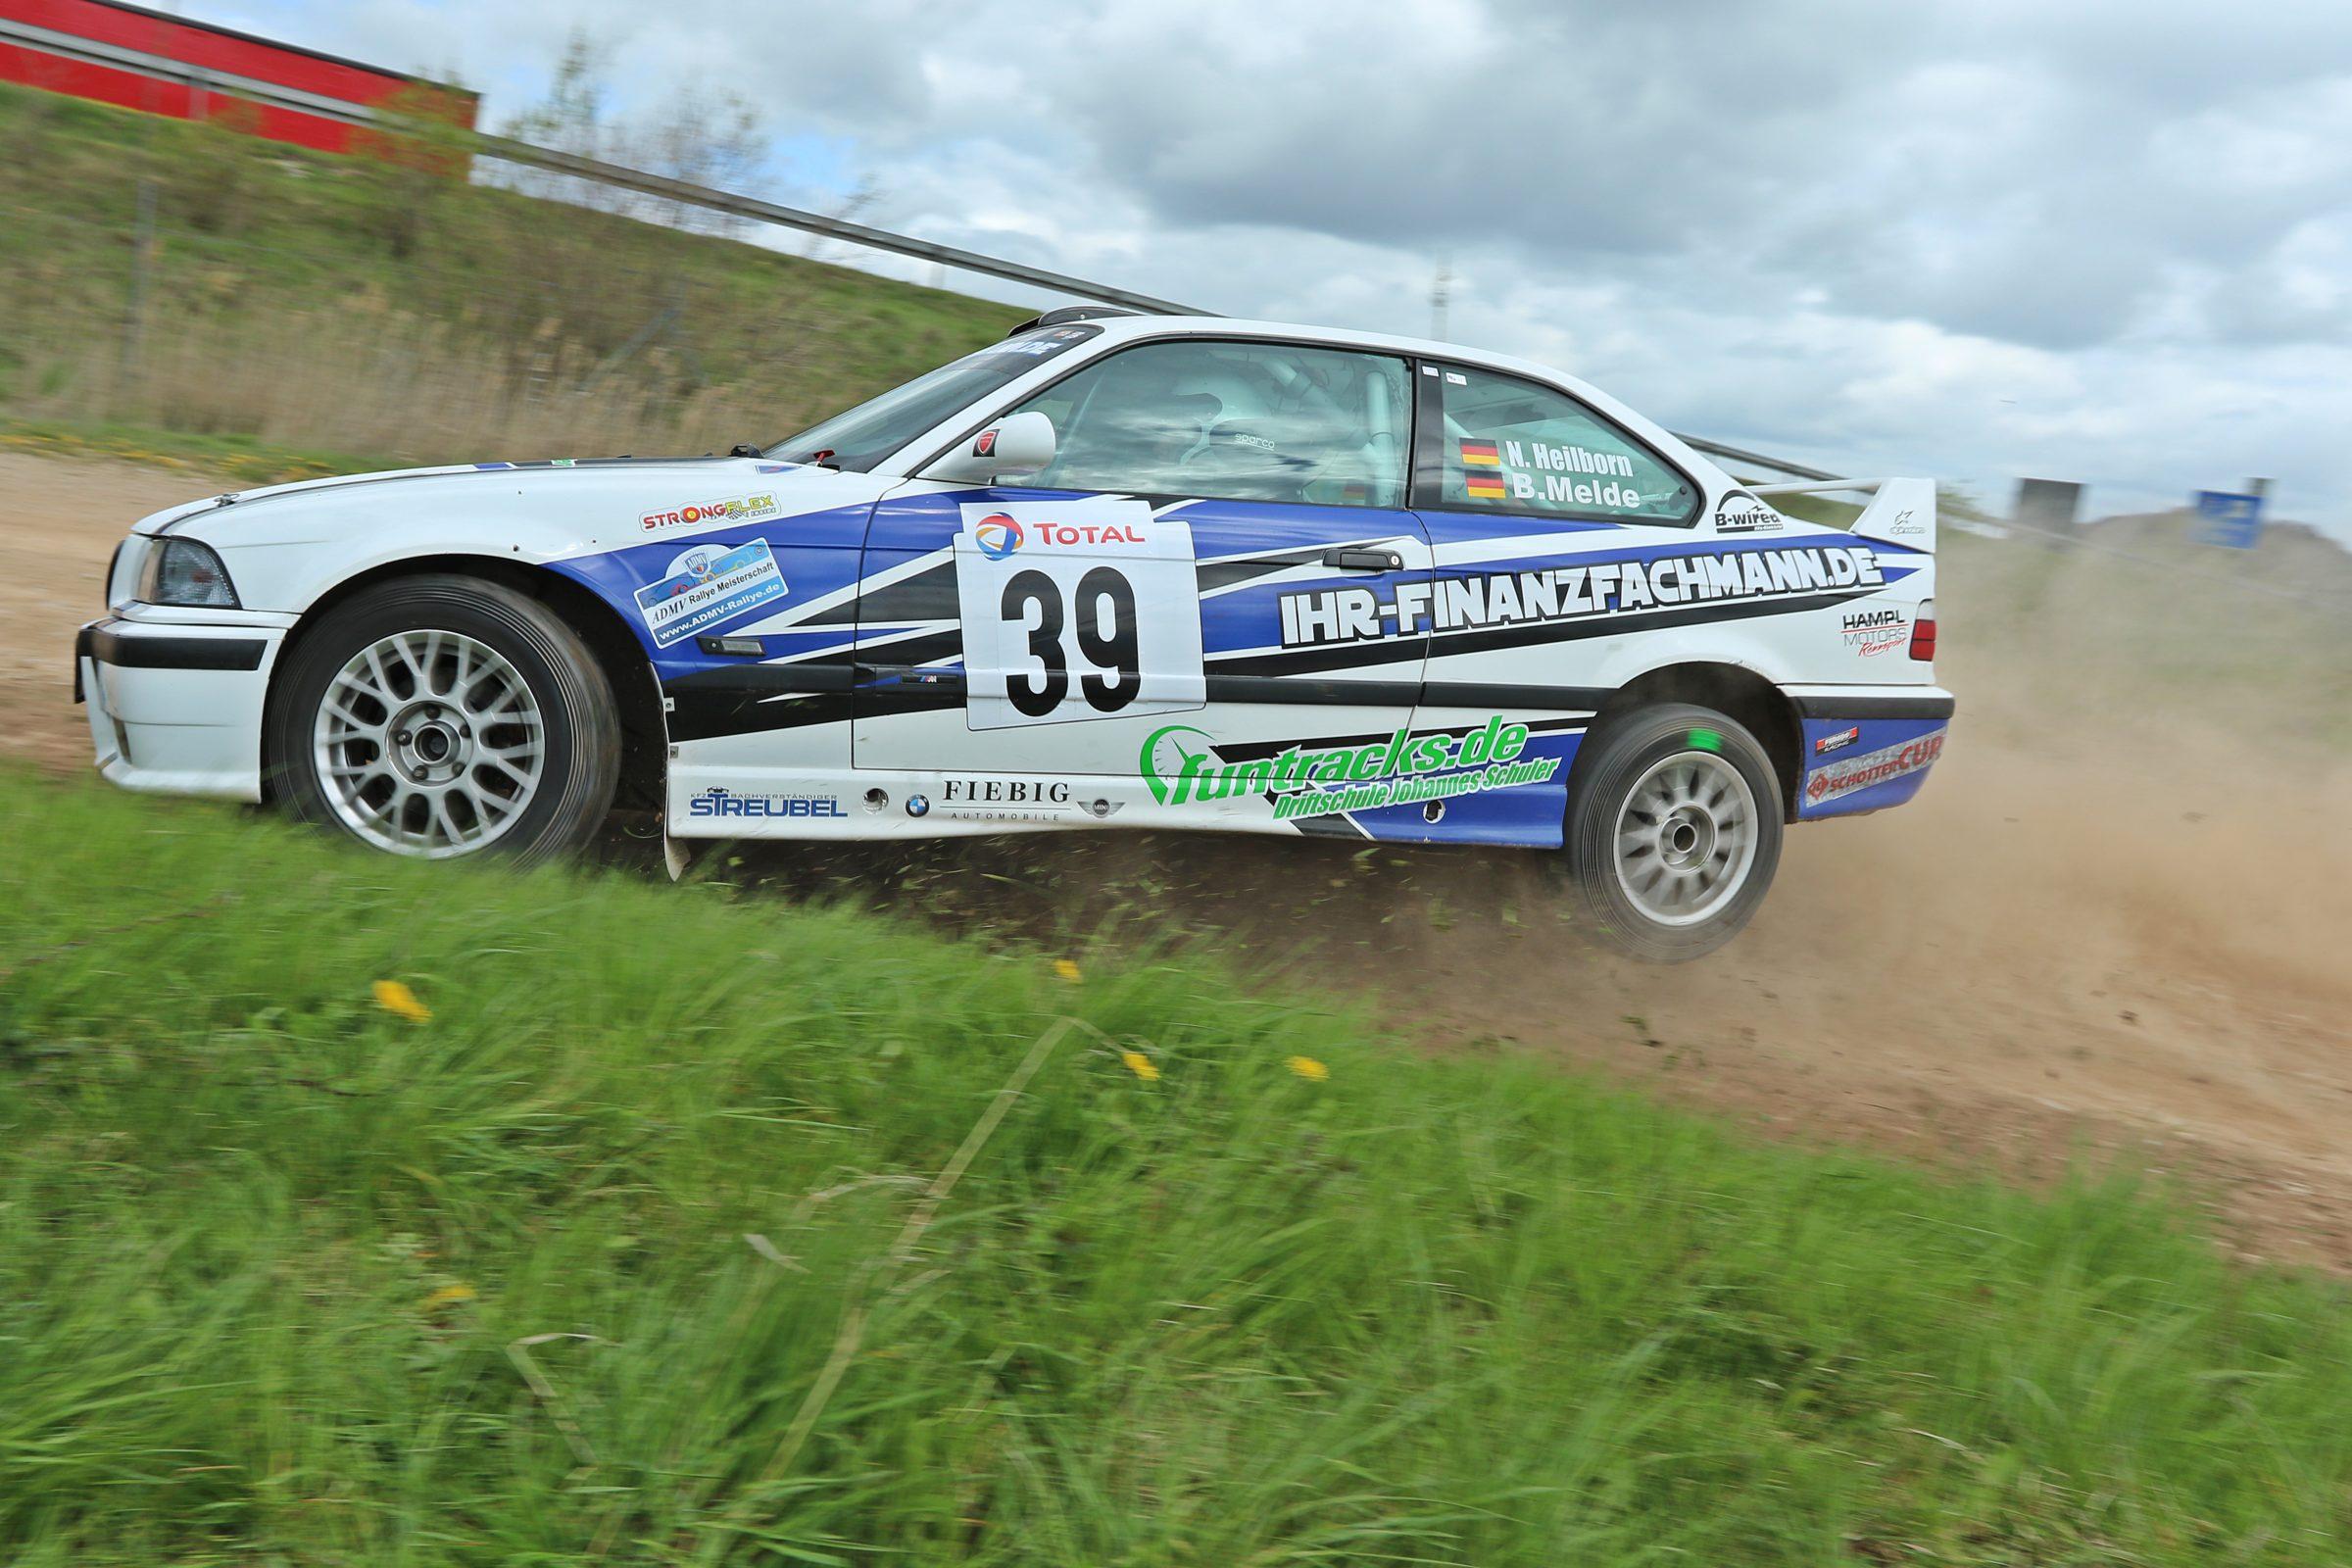 47. ADAC Roland Rallye 22.04.2017